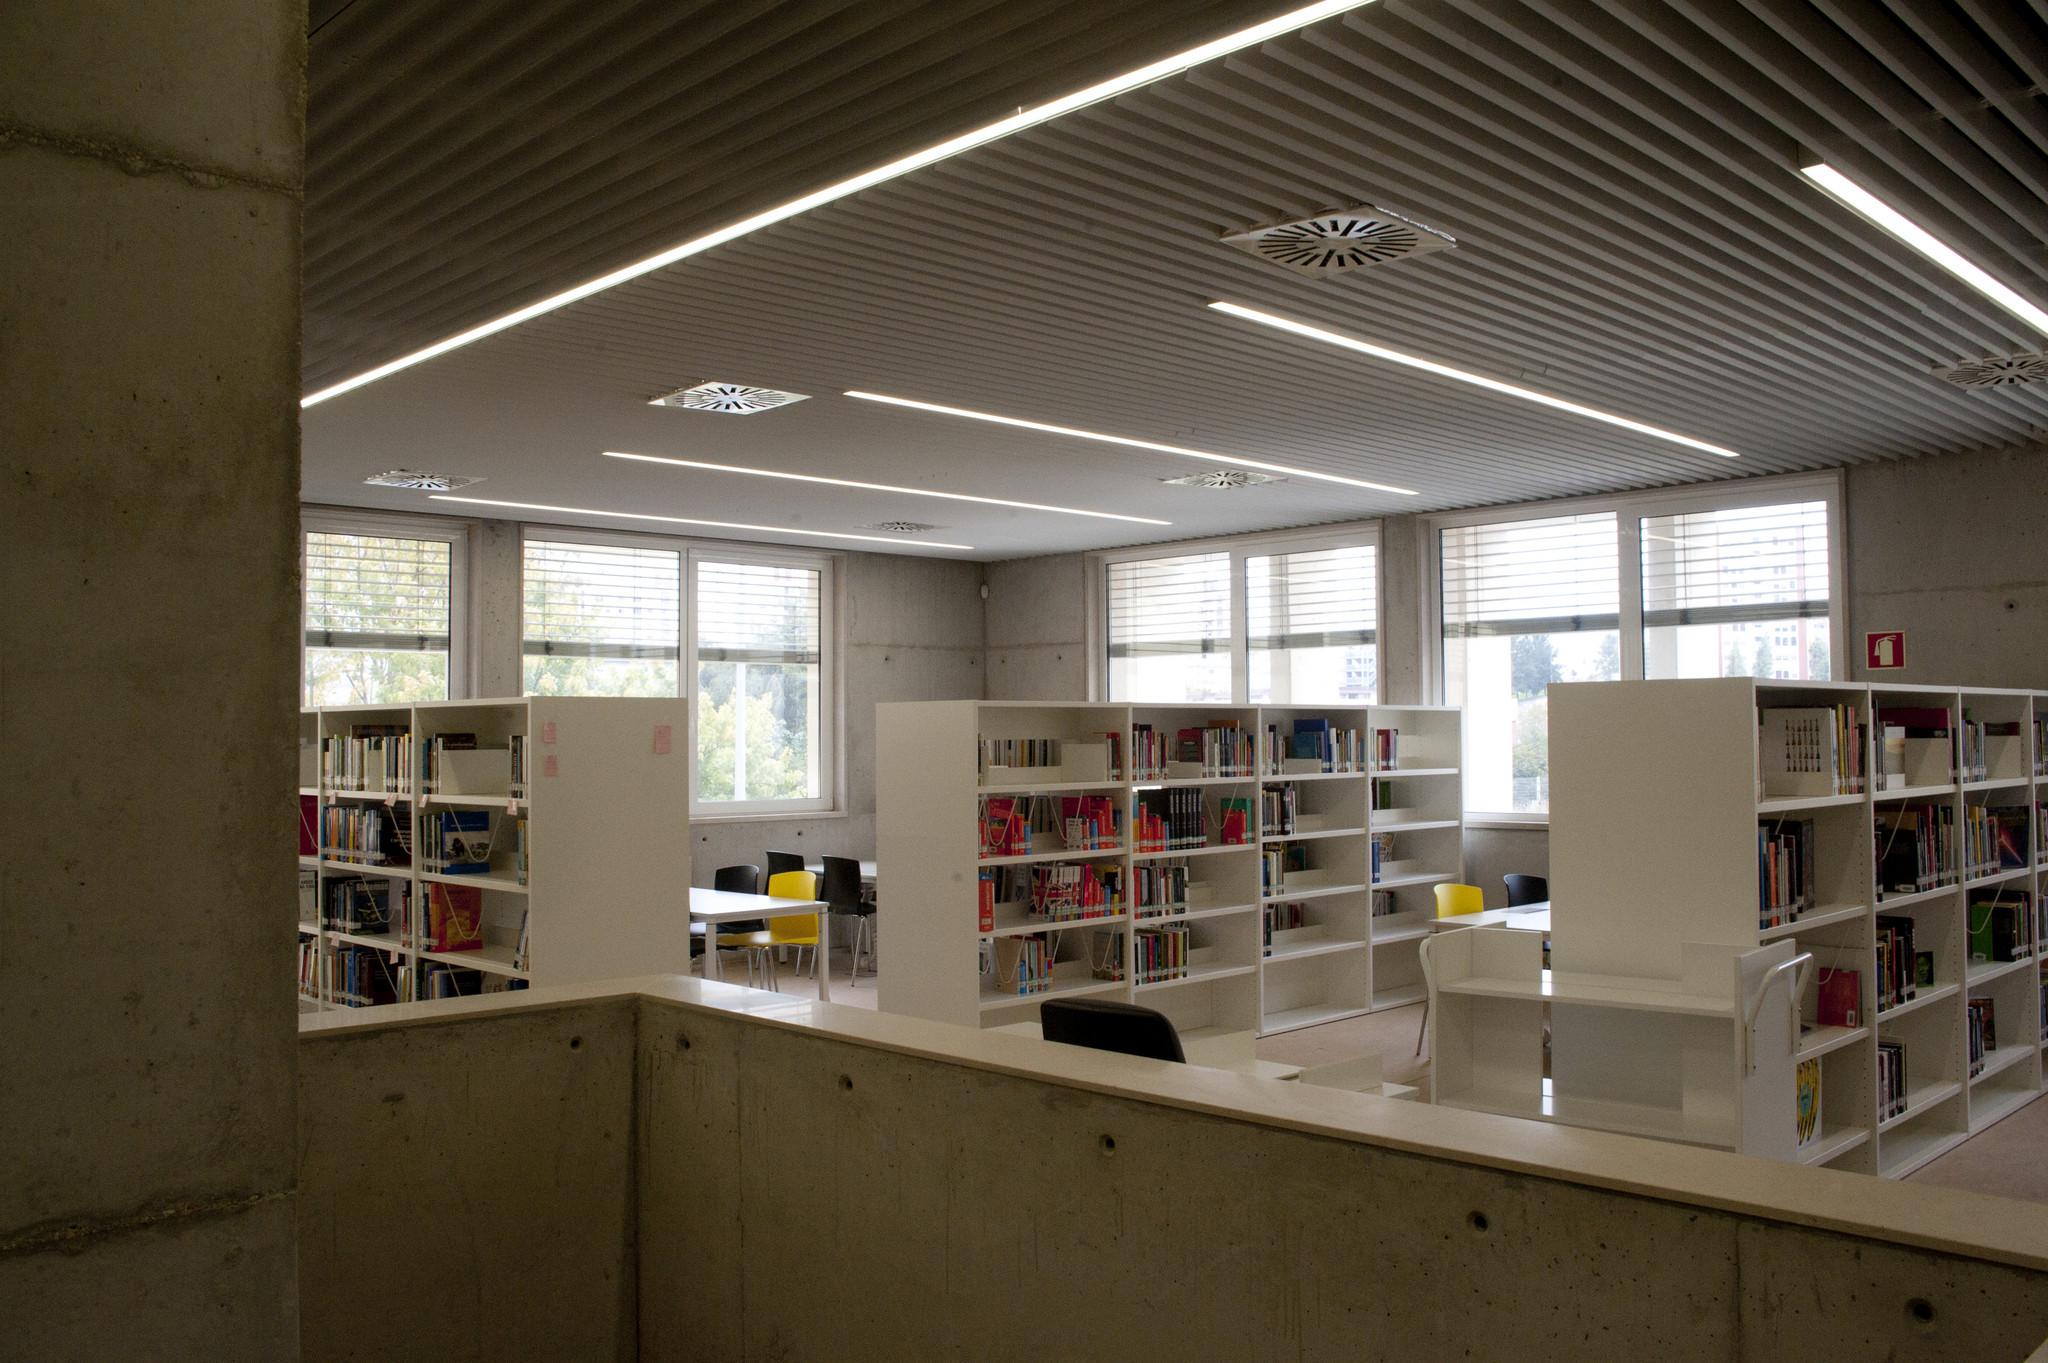 abr_biblioteca_marvila_014.jpg